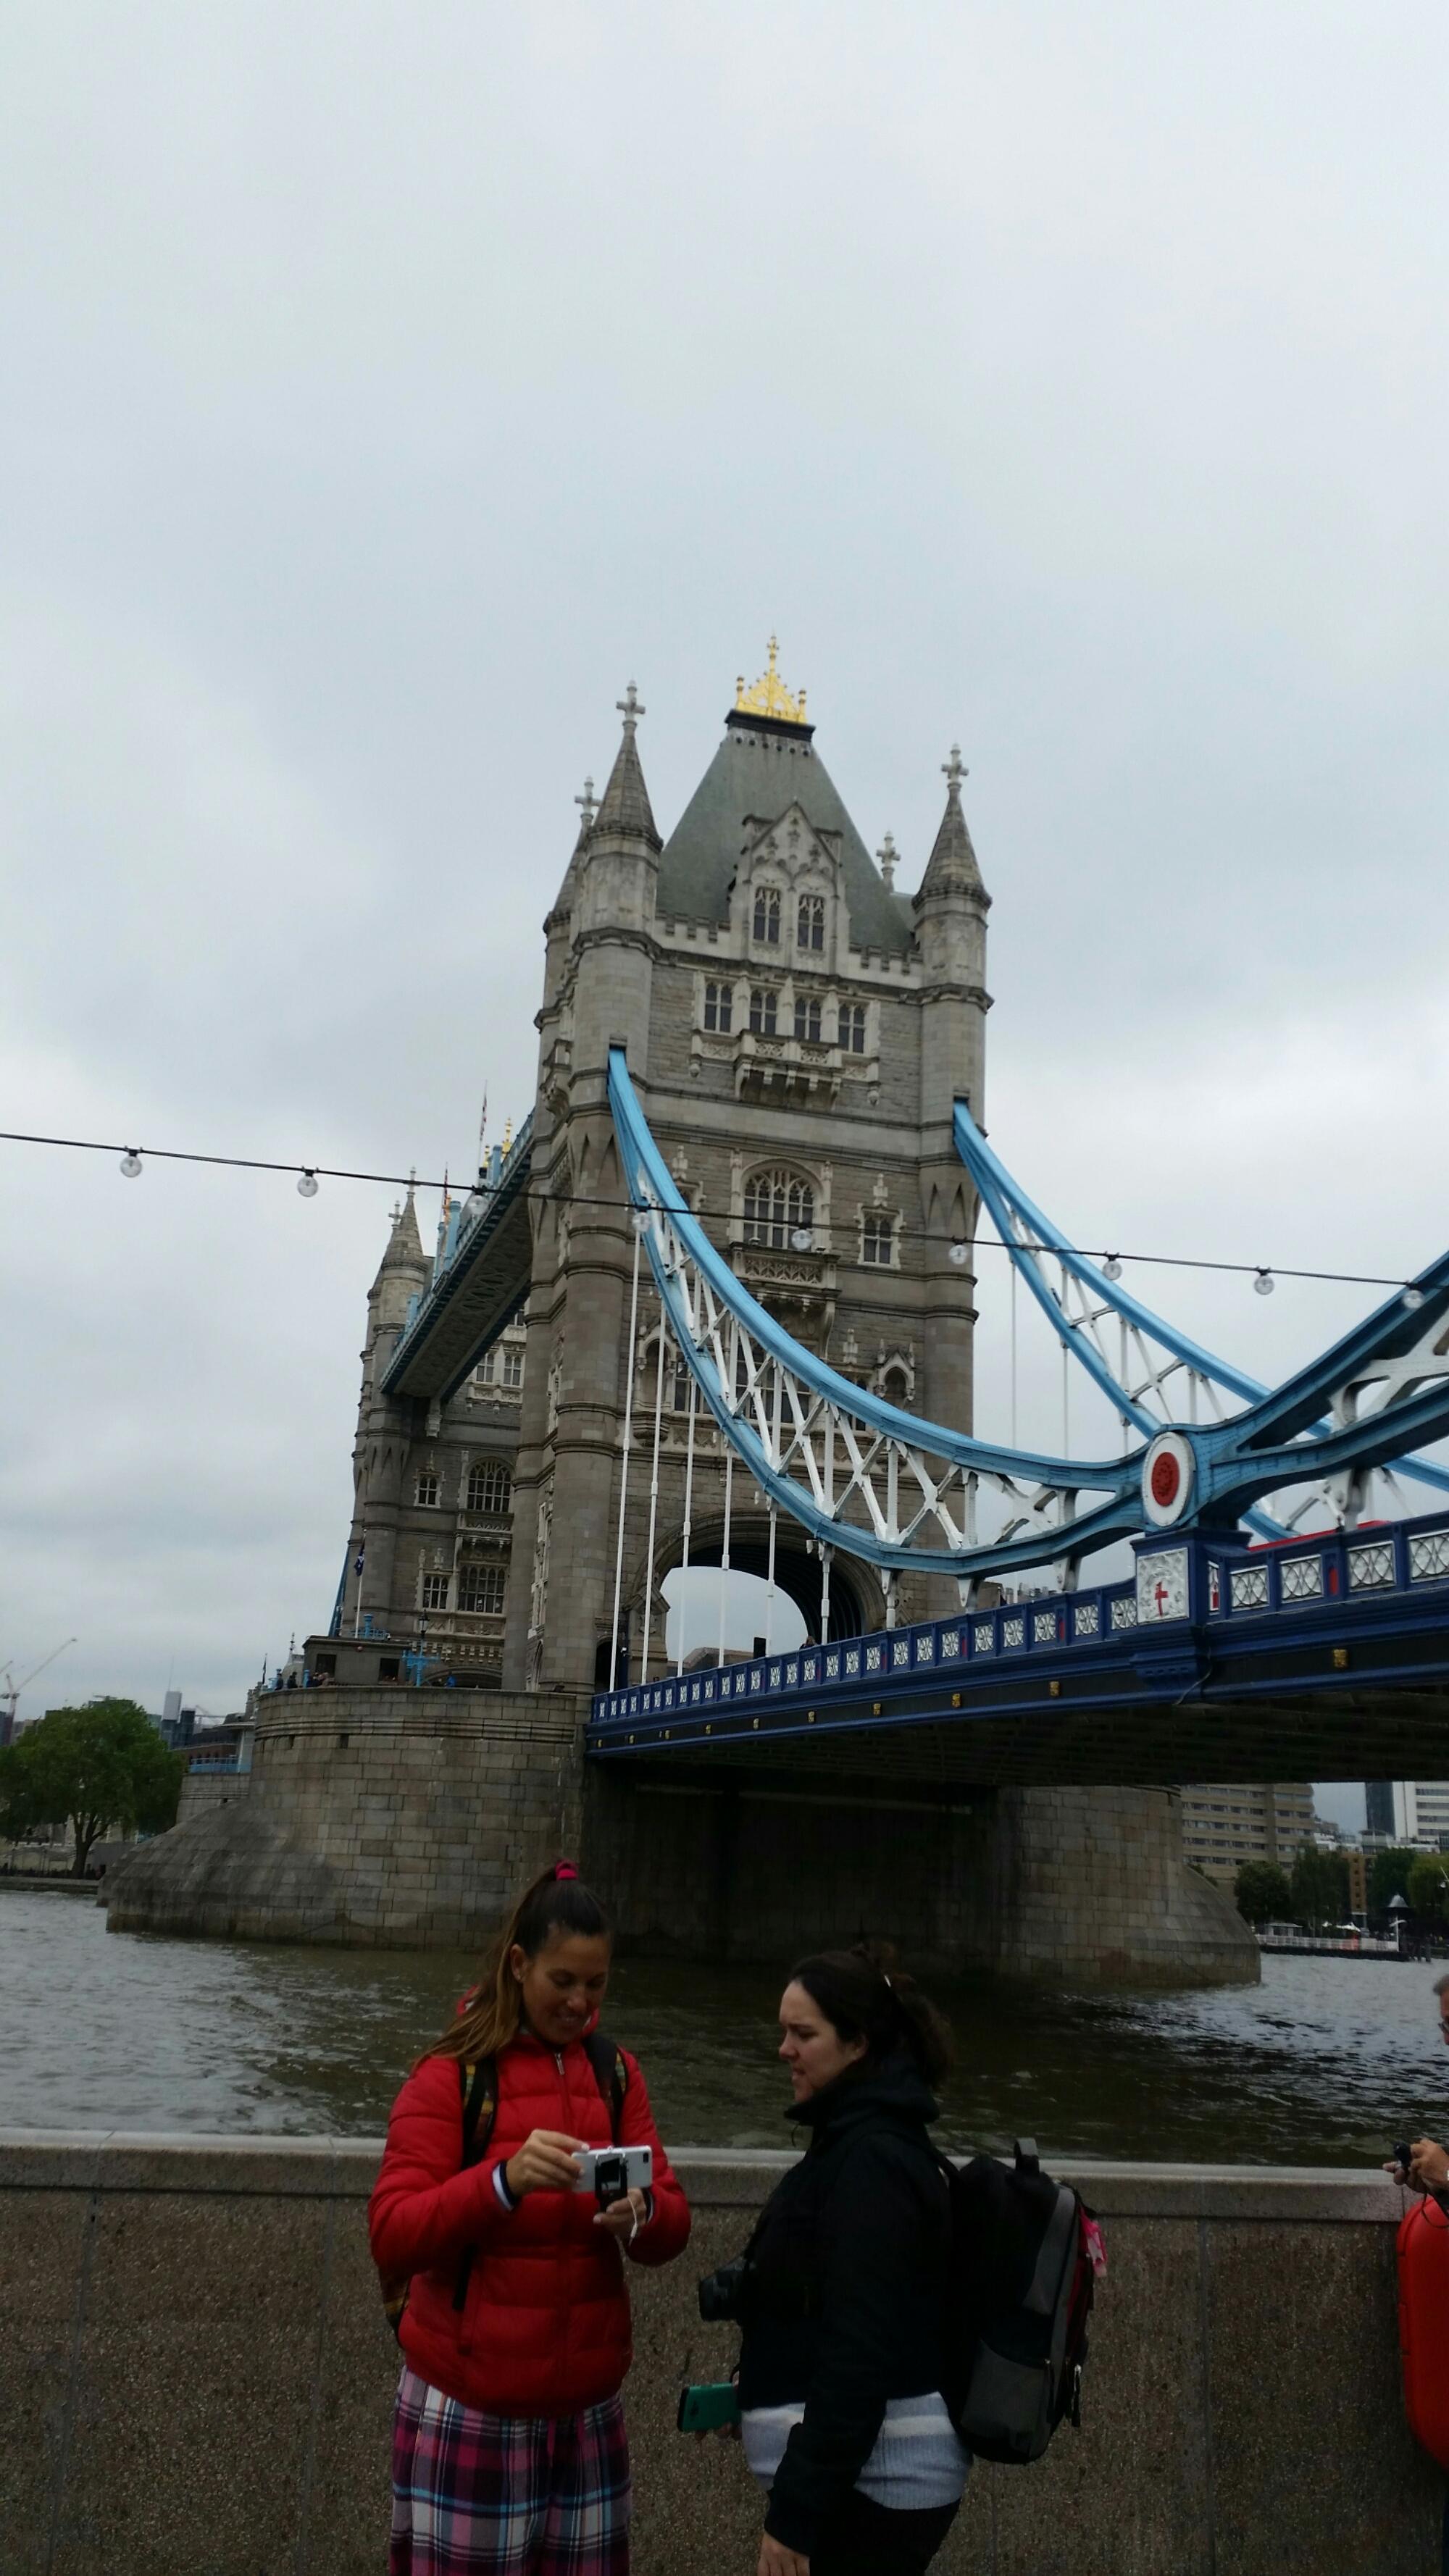 Tower Bridge Exhibition, London